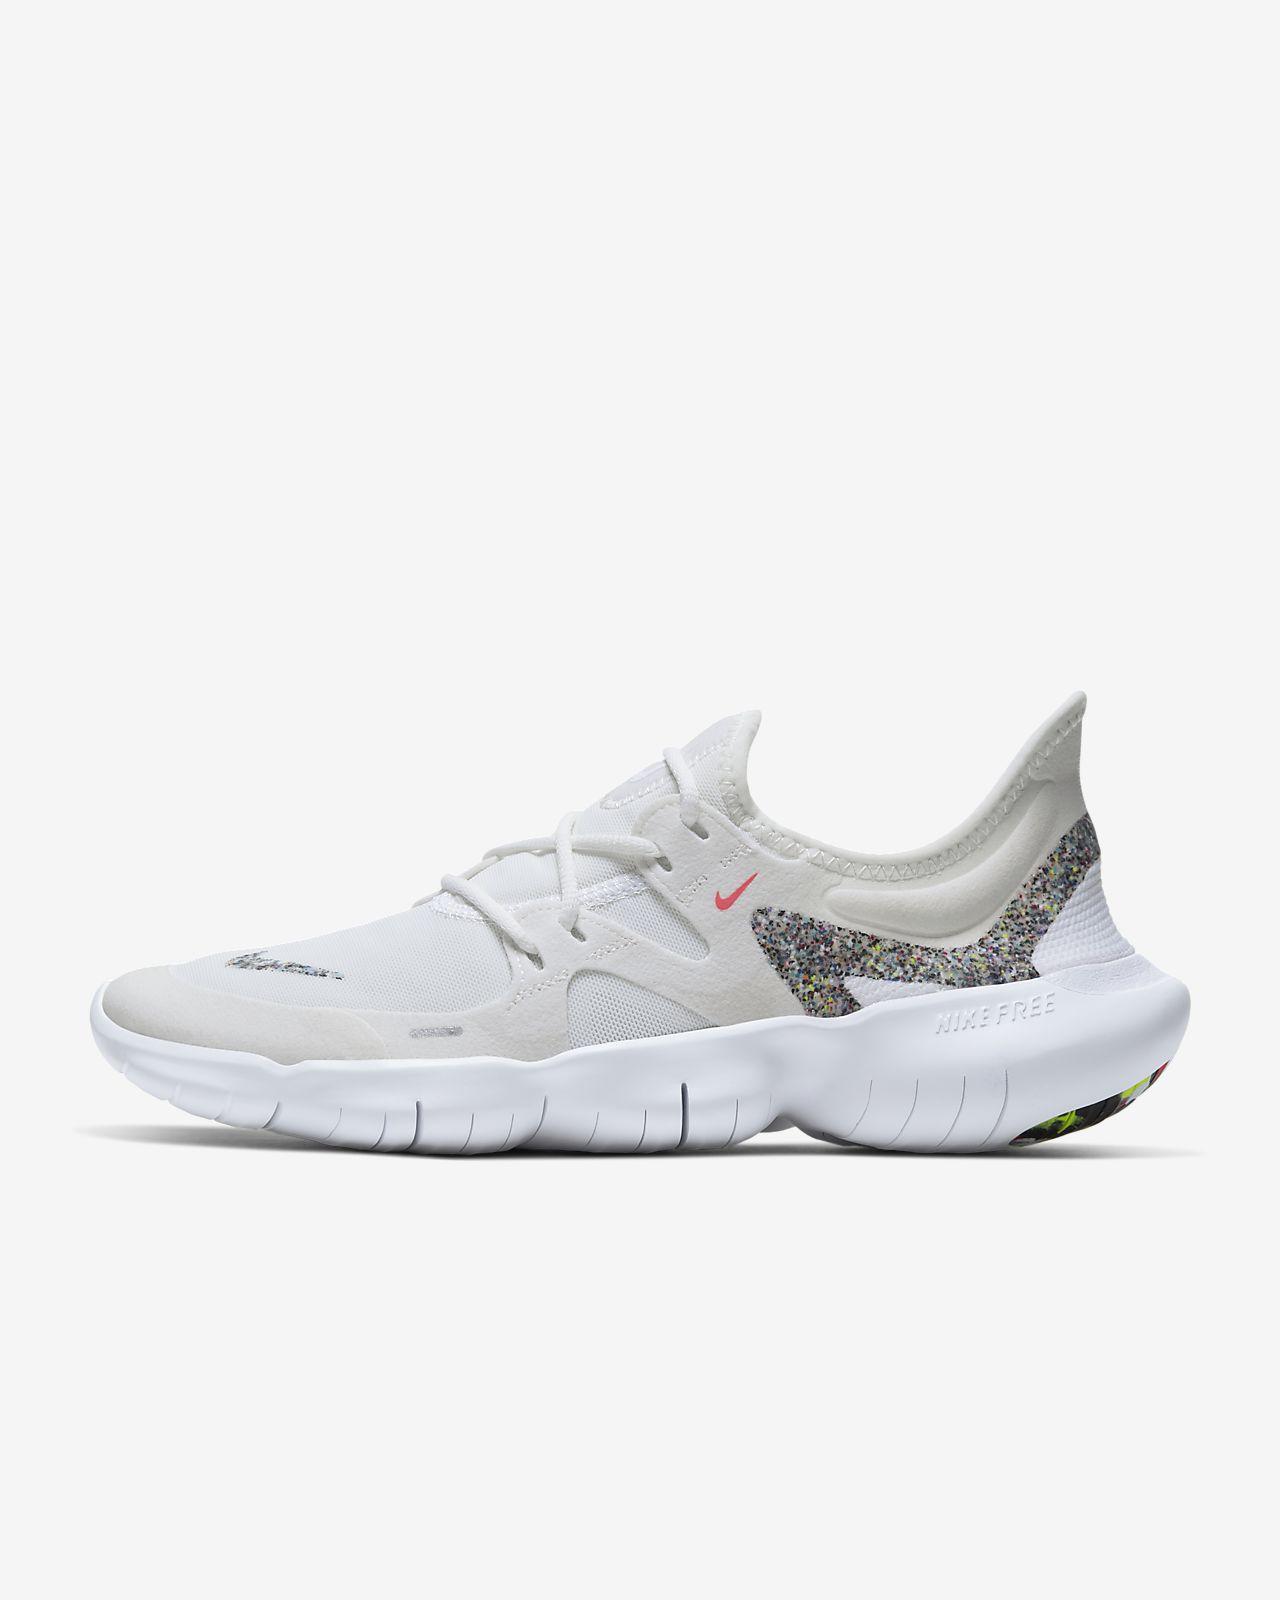 Nike Free RN 5.0 AW Women's Running Shoe